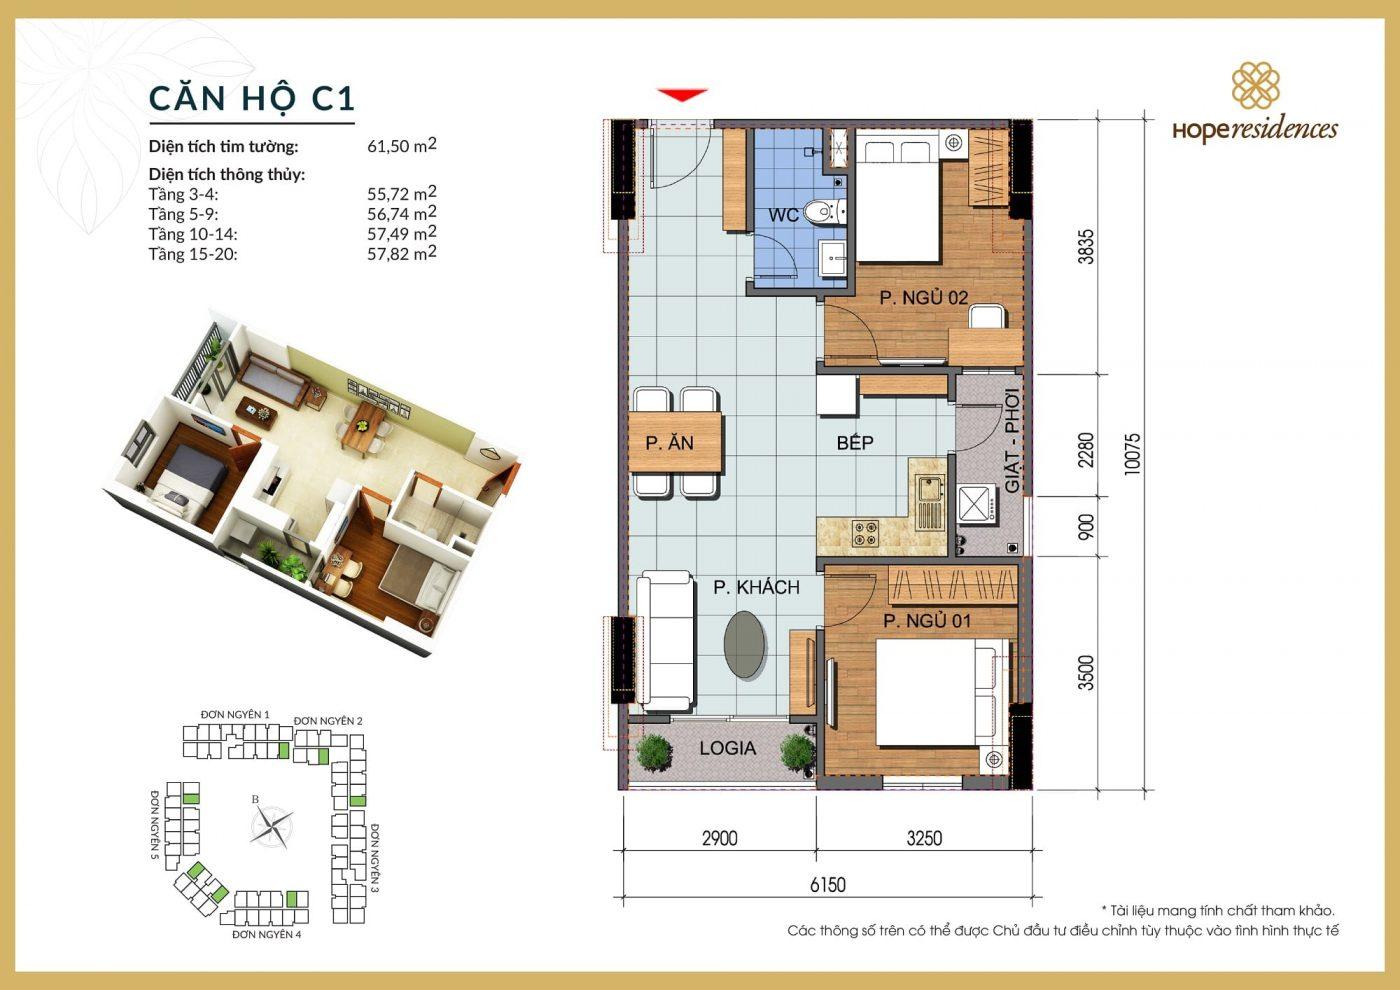 mat bang thiet ke can ho c1 hope residences